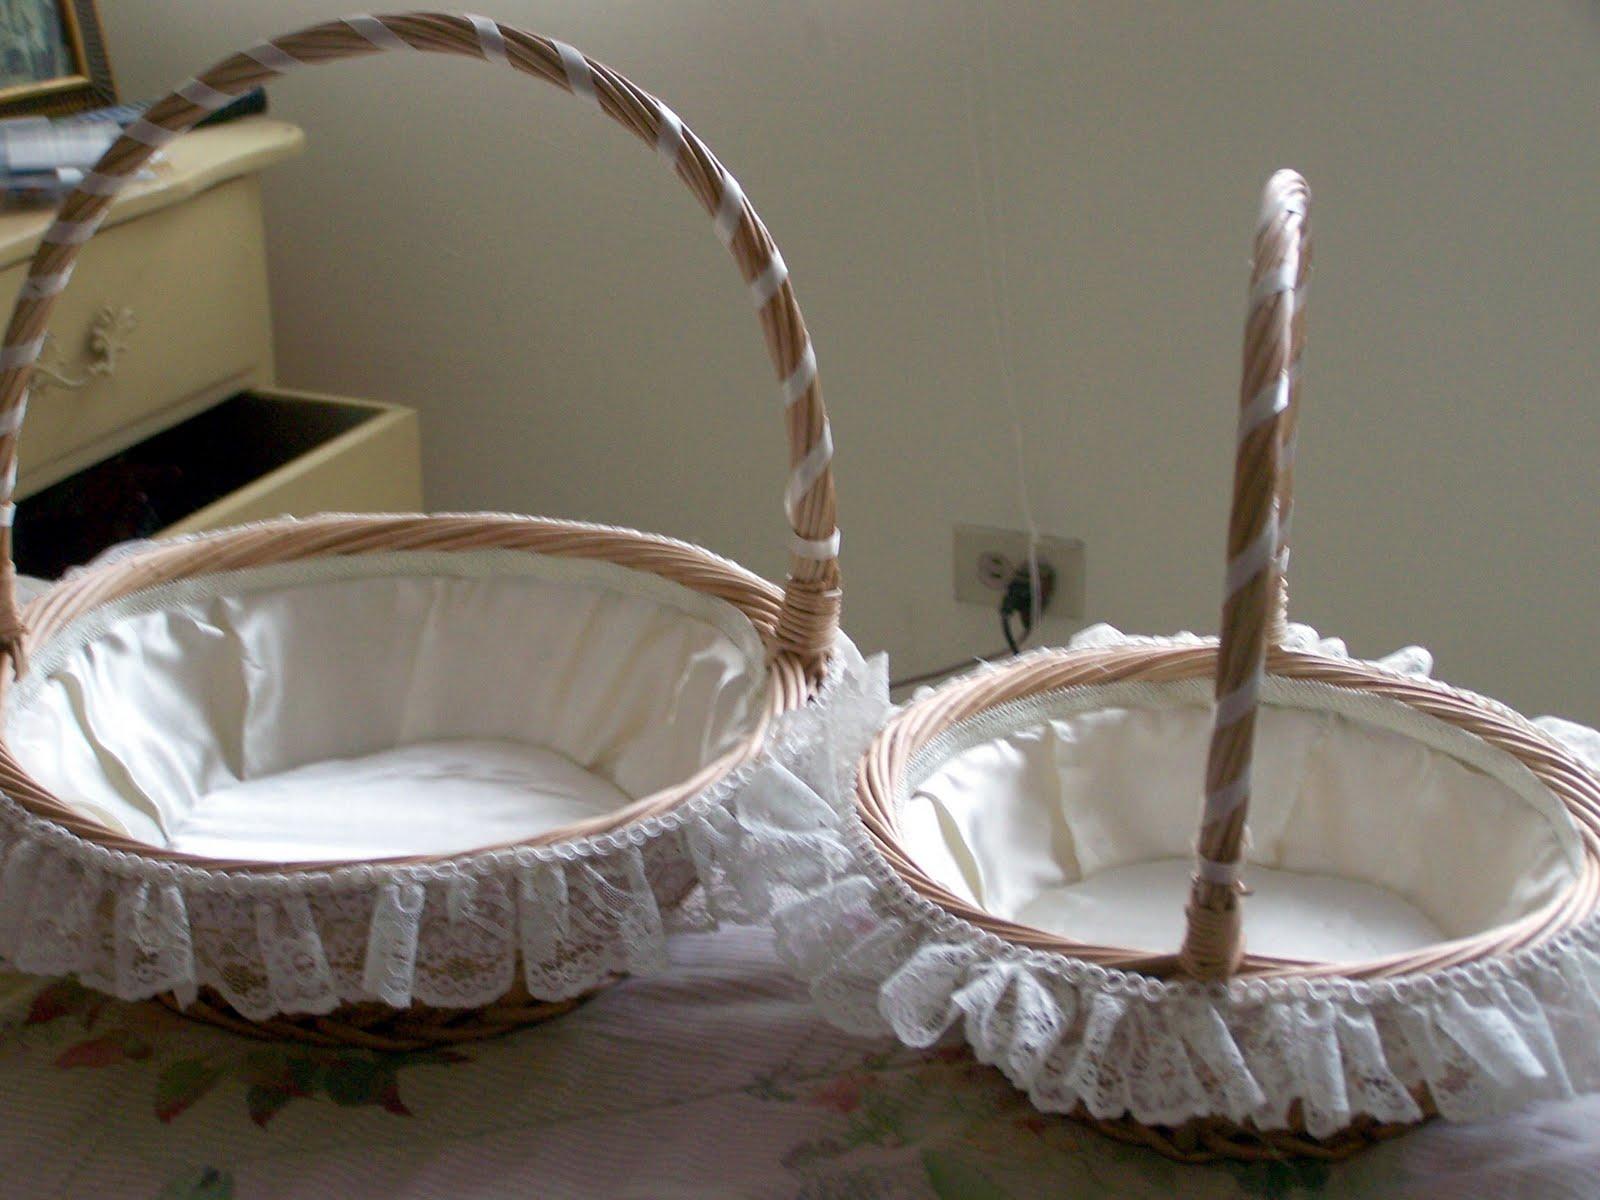 Clairesdetails: Como adornar canastas para primeras comuniones y bodas